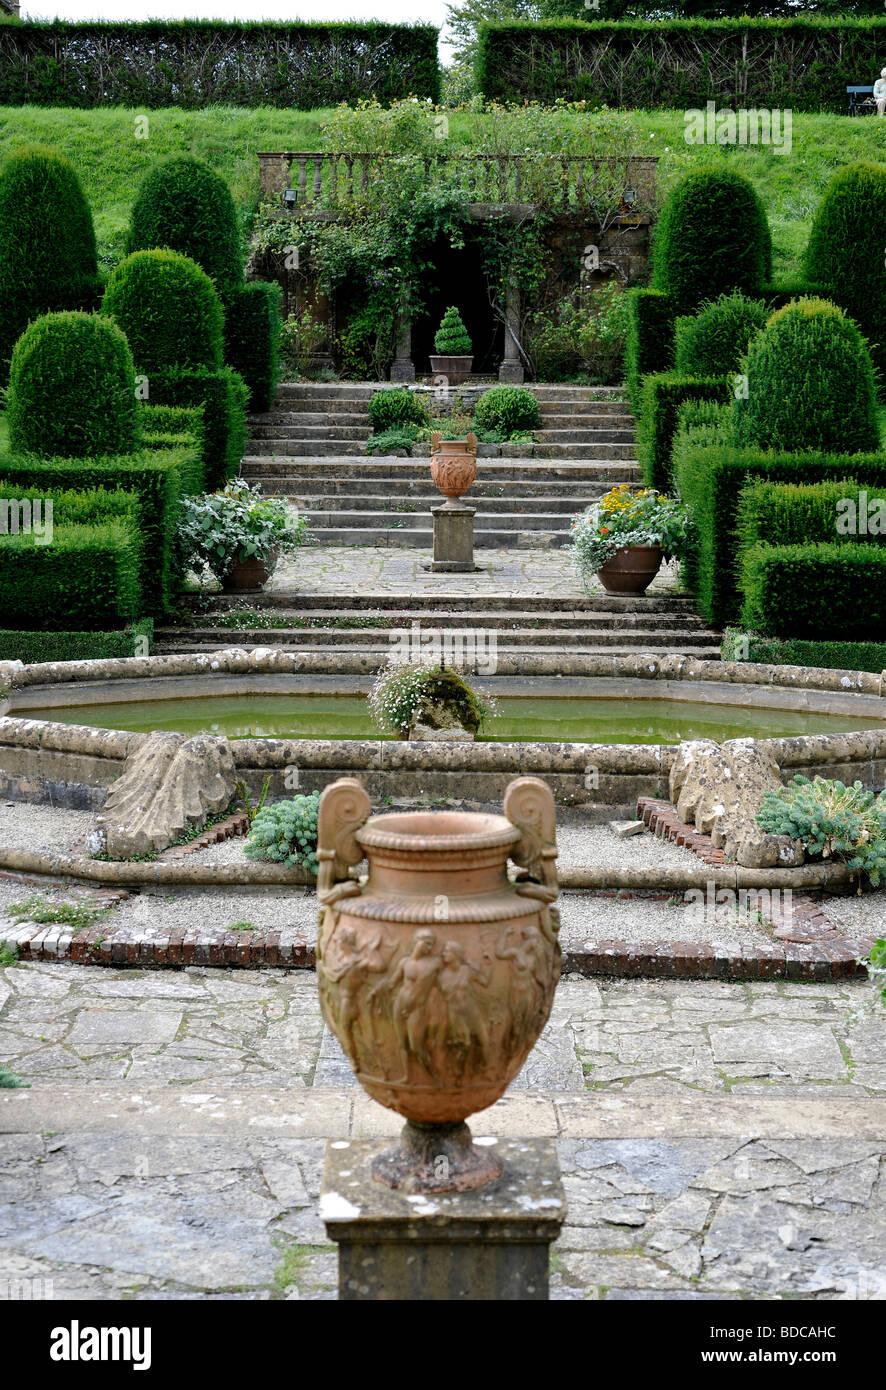 Mapperton Gardens, and Jacobean manor house in Beaminster, Dorset, UK. Landscaped gardens. - Stock Image